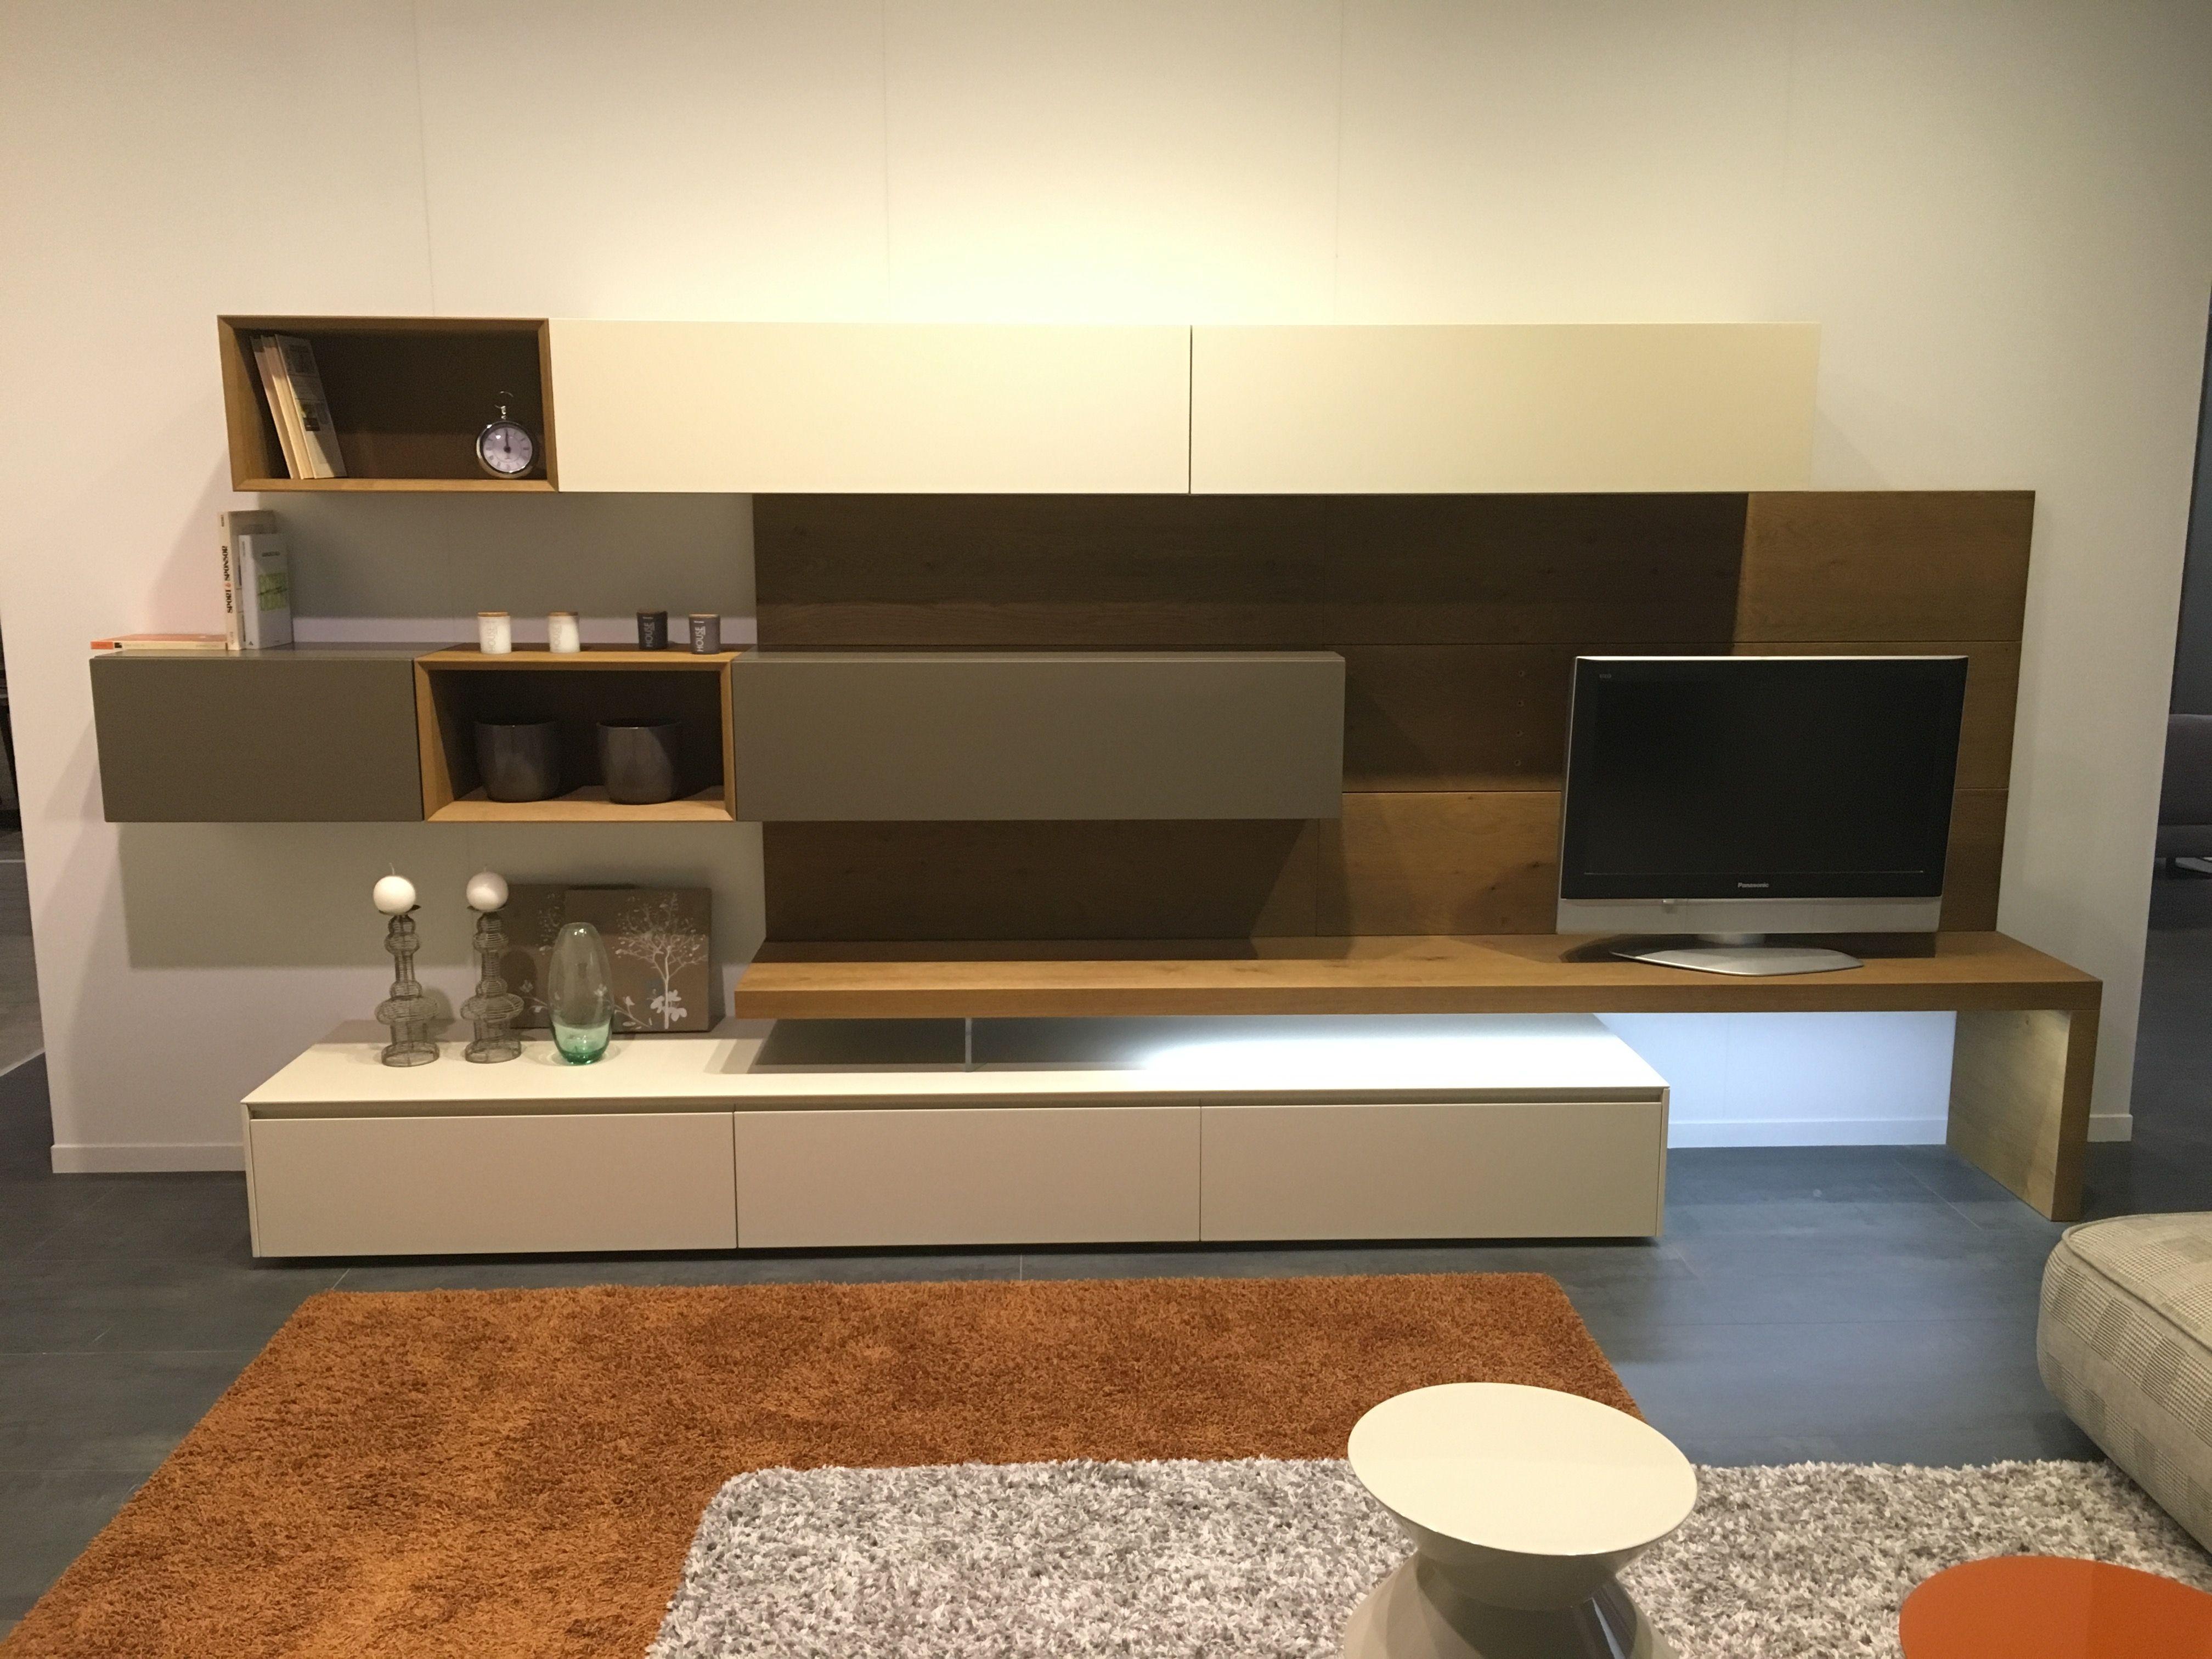 Cucina Interior Design Tv | Forum Arredamento It Aiuto Arredamento ...